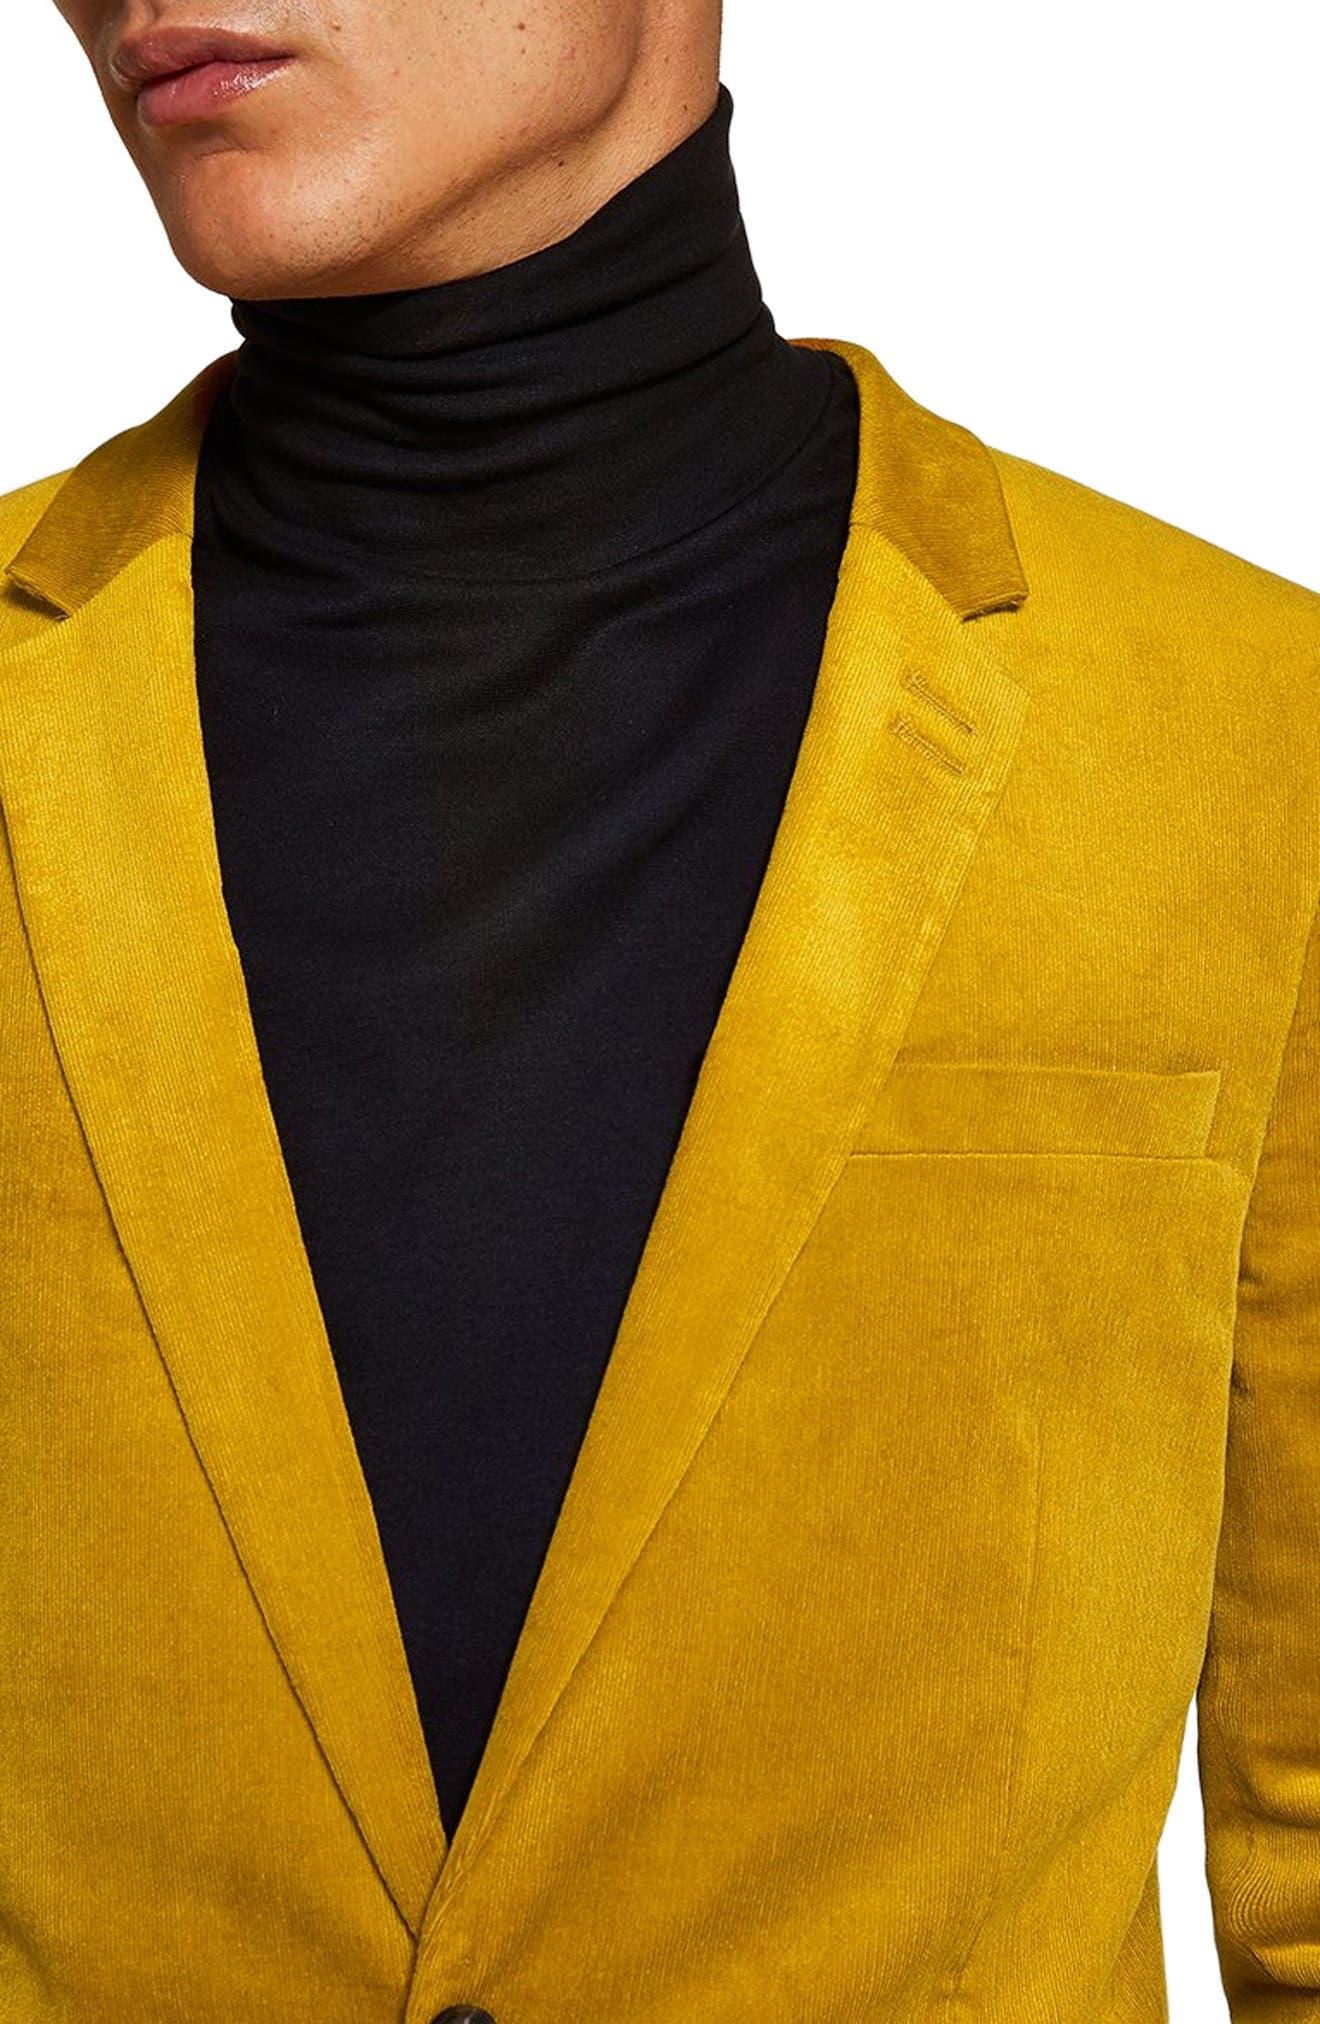 TOPMAN,                             Corduroy Super Skinny Suit Jacket,                             Alternate thumbnail 3, color,                             700